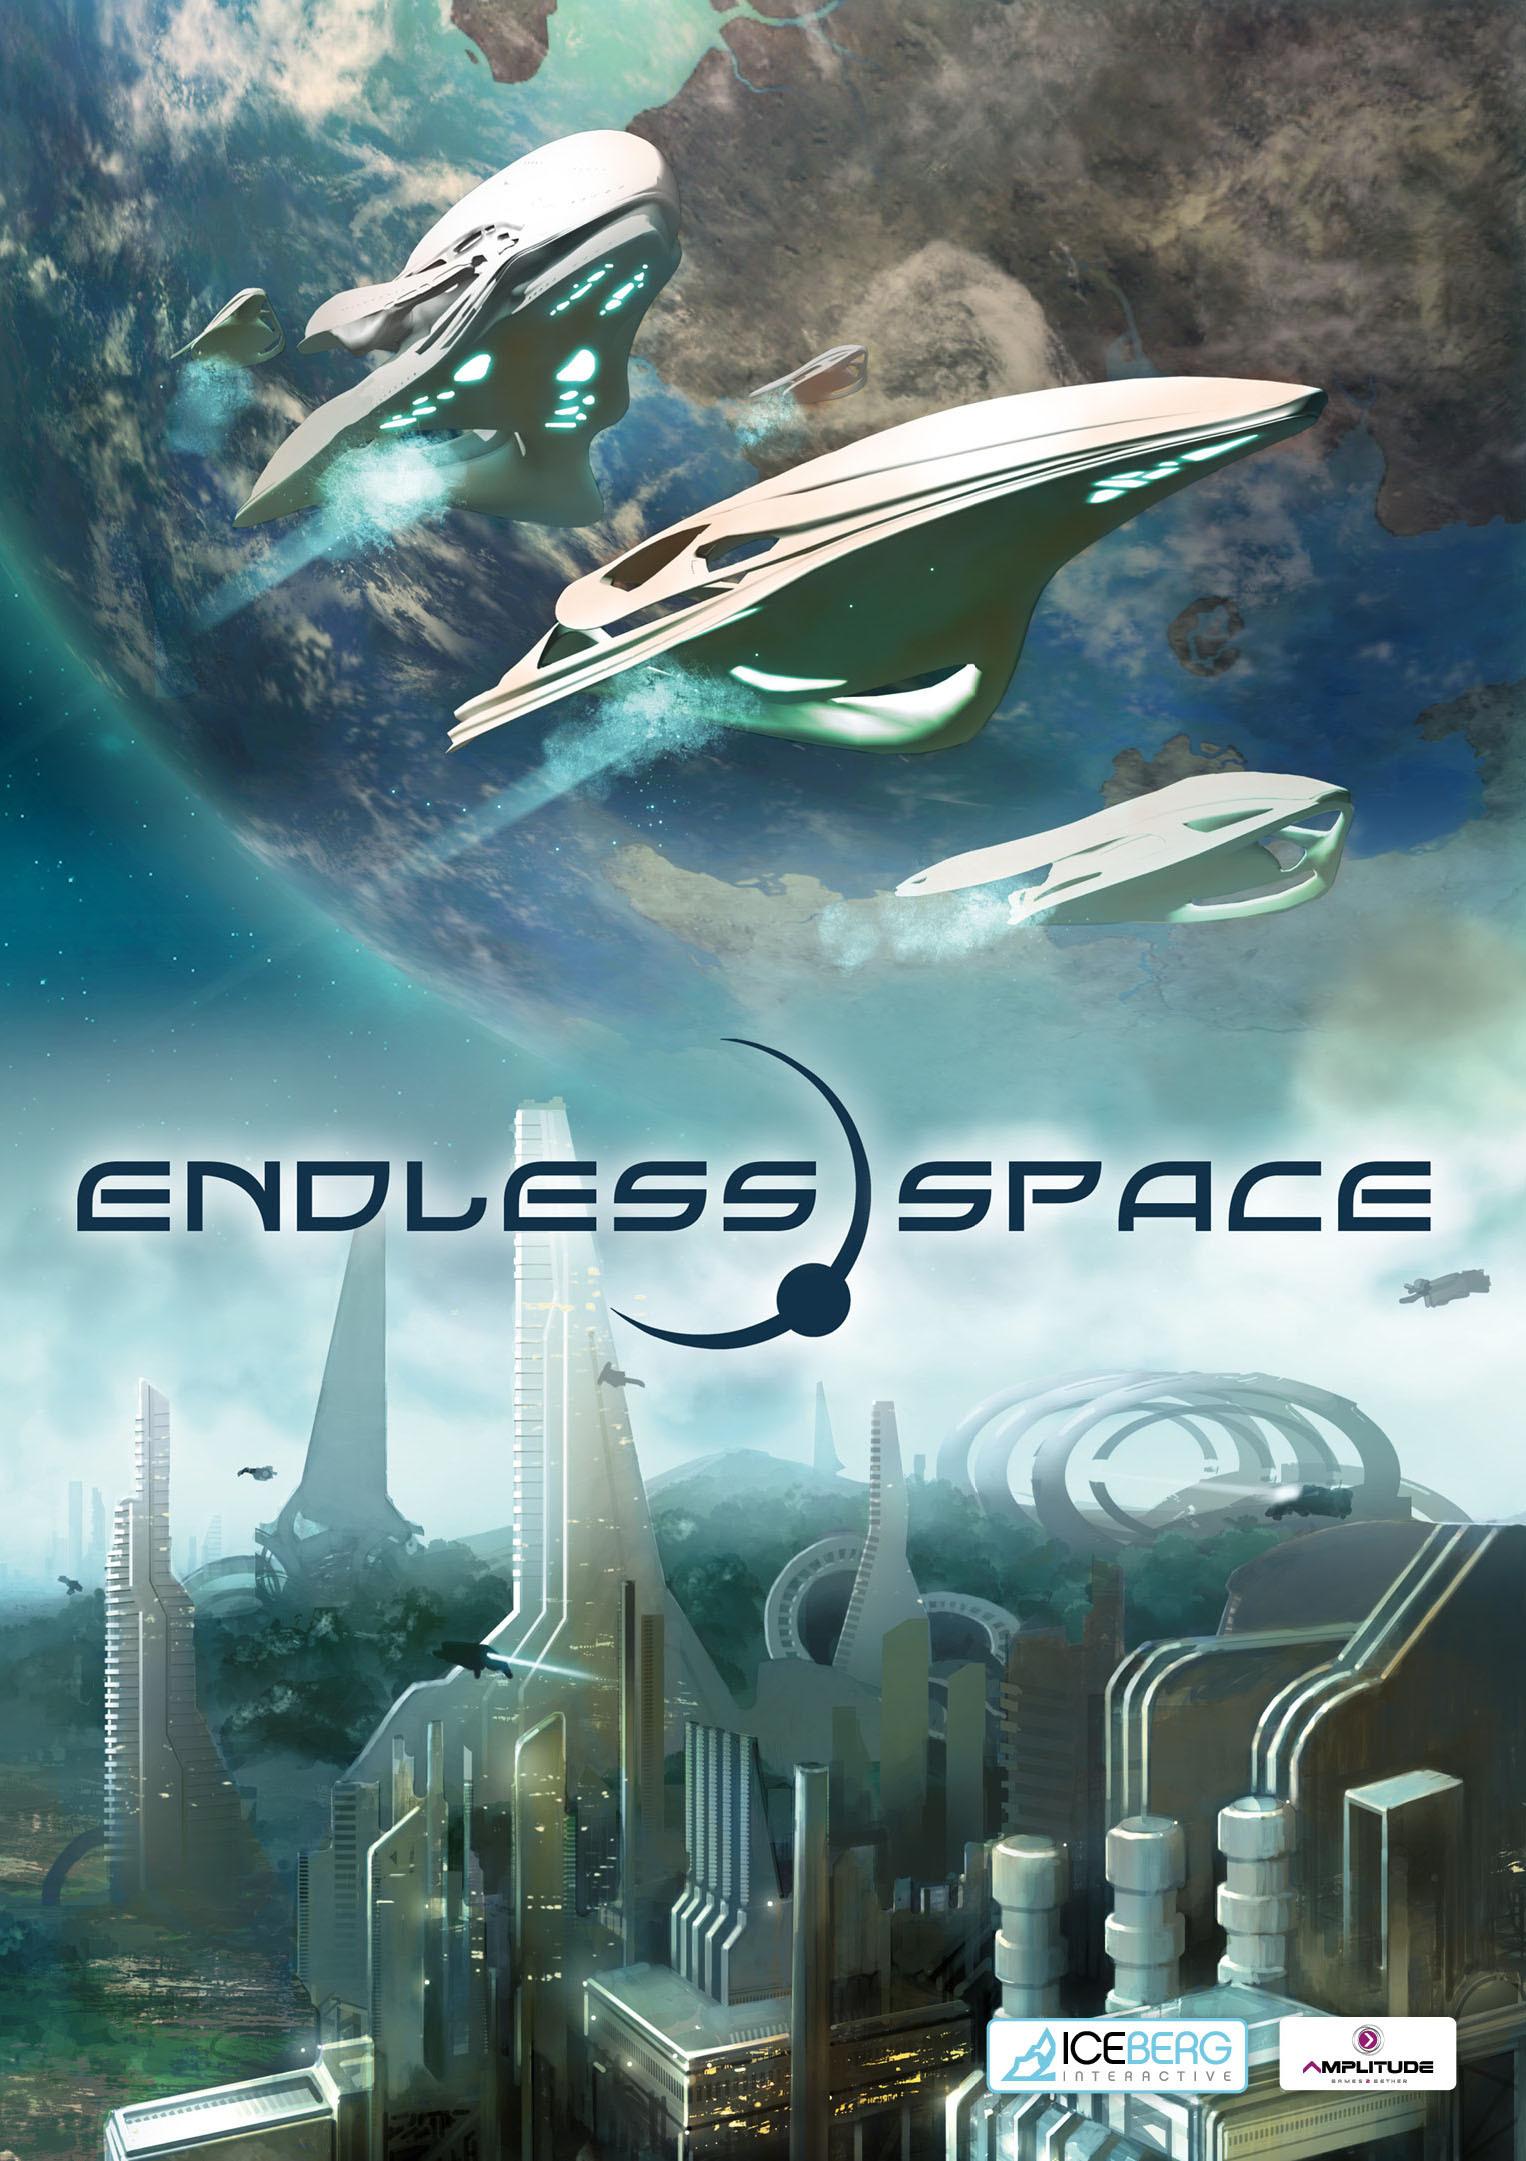 Endless Space 2 Ship Concept Art